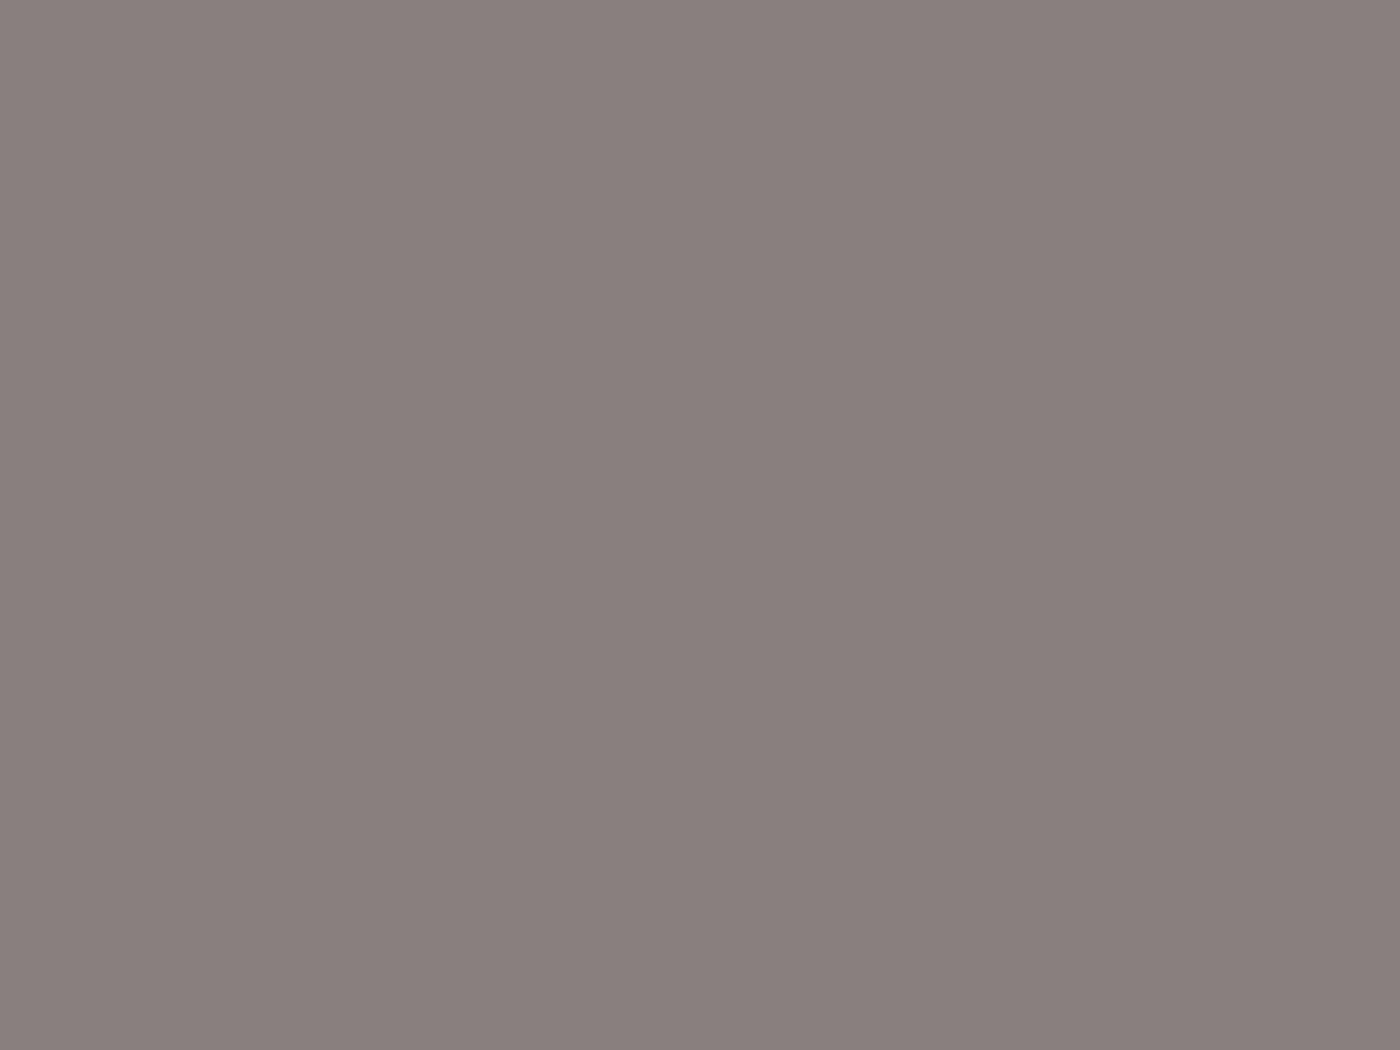 1400x1050 Rocket Metallic Solid Color Background